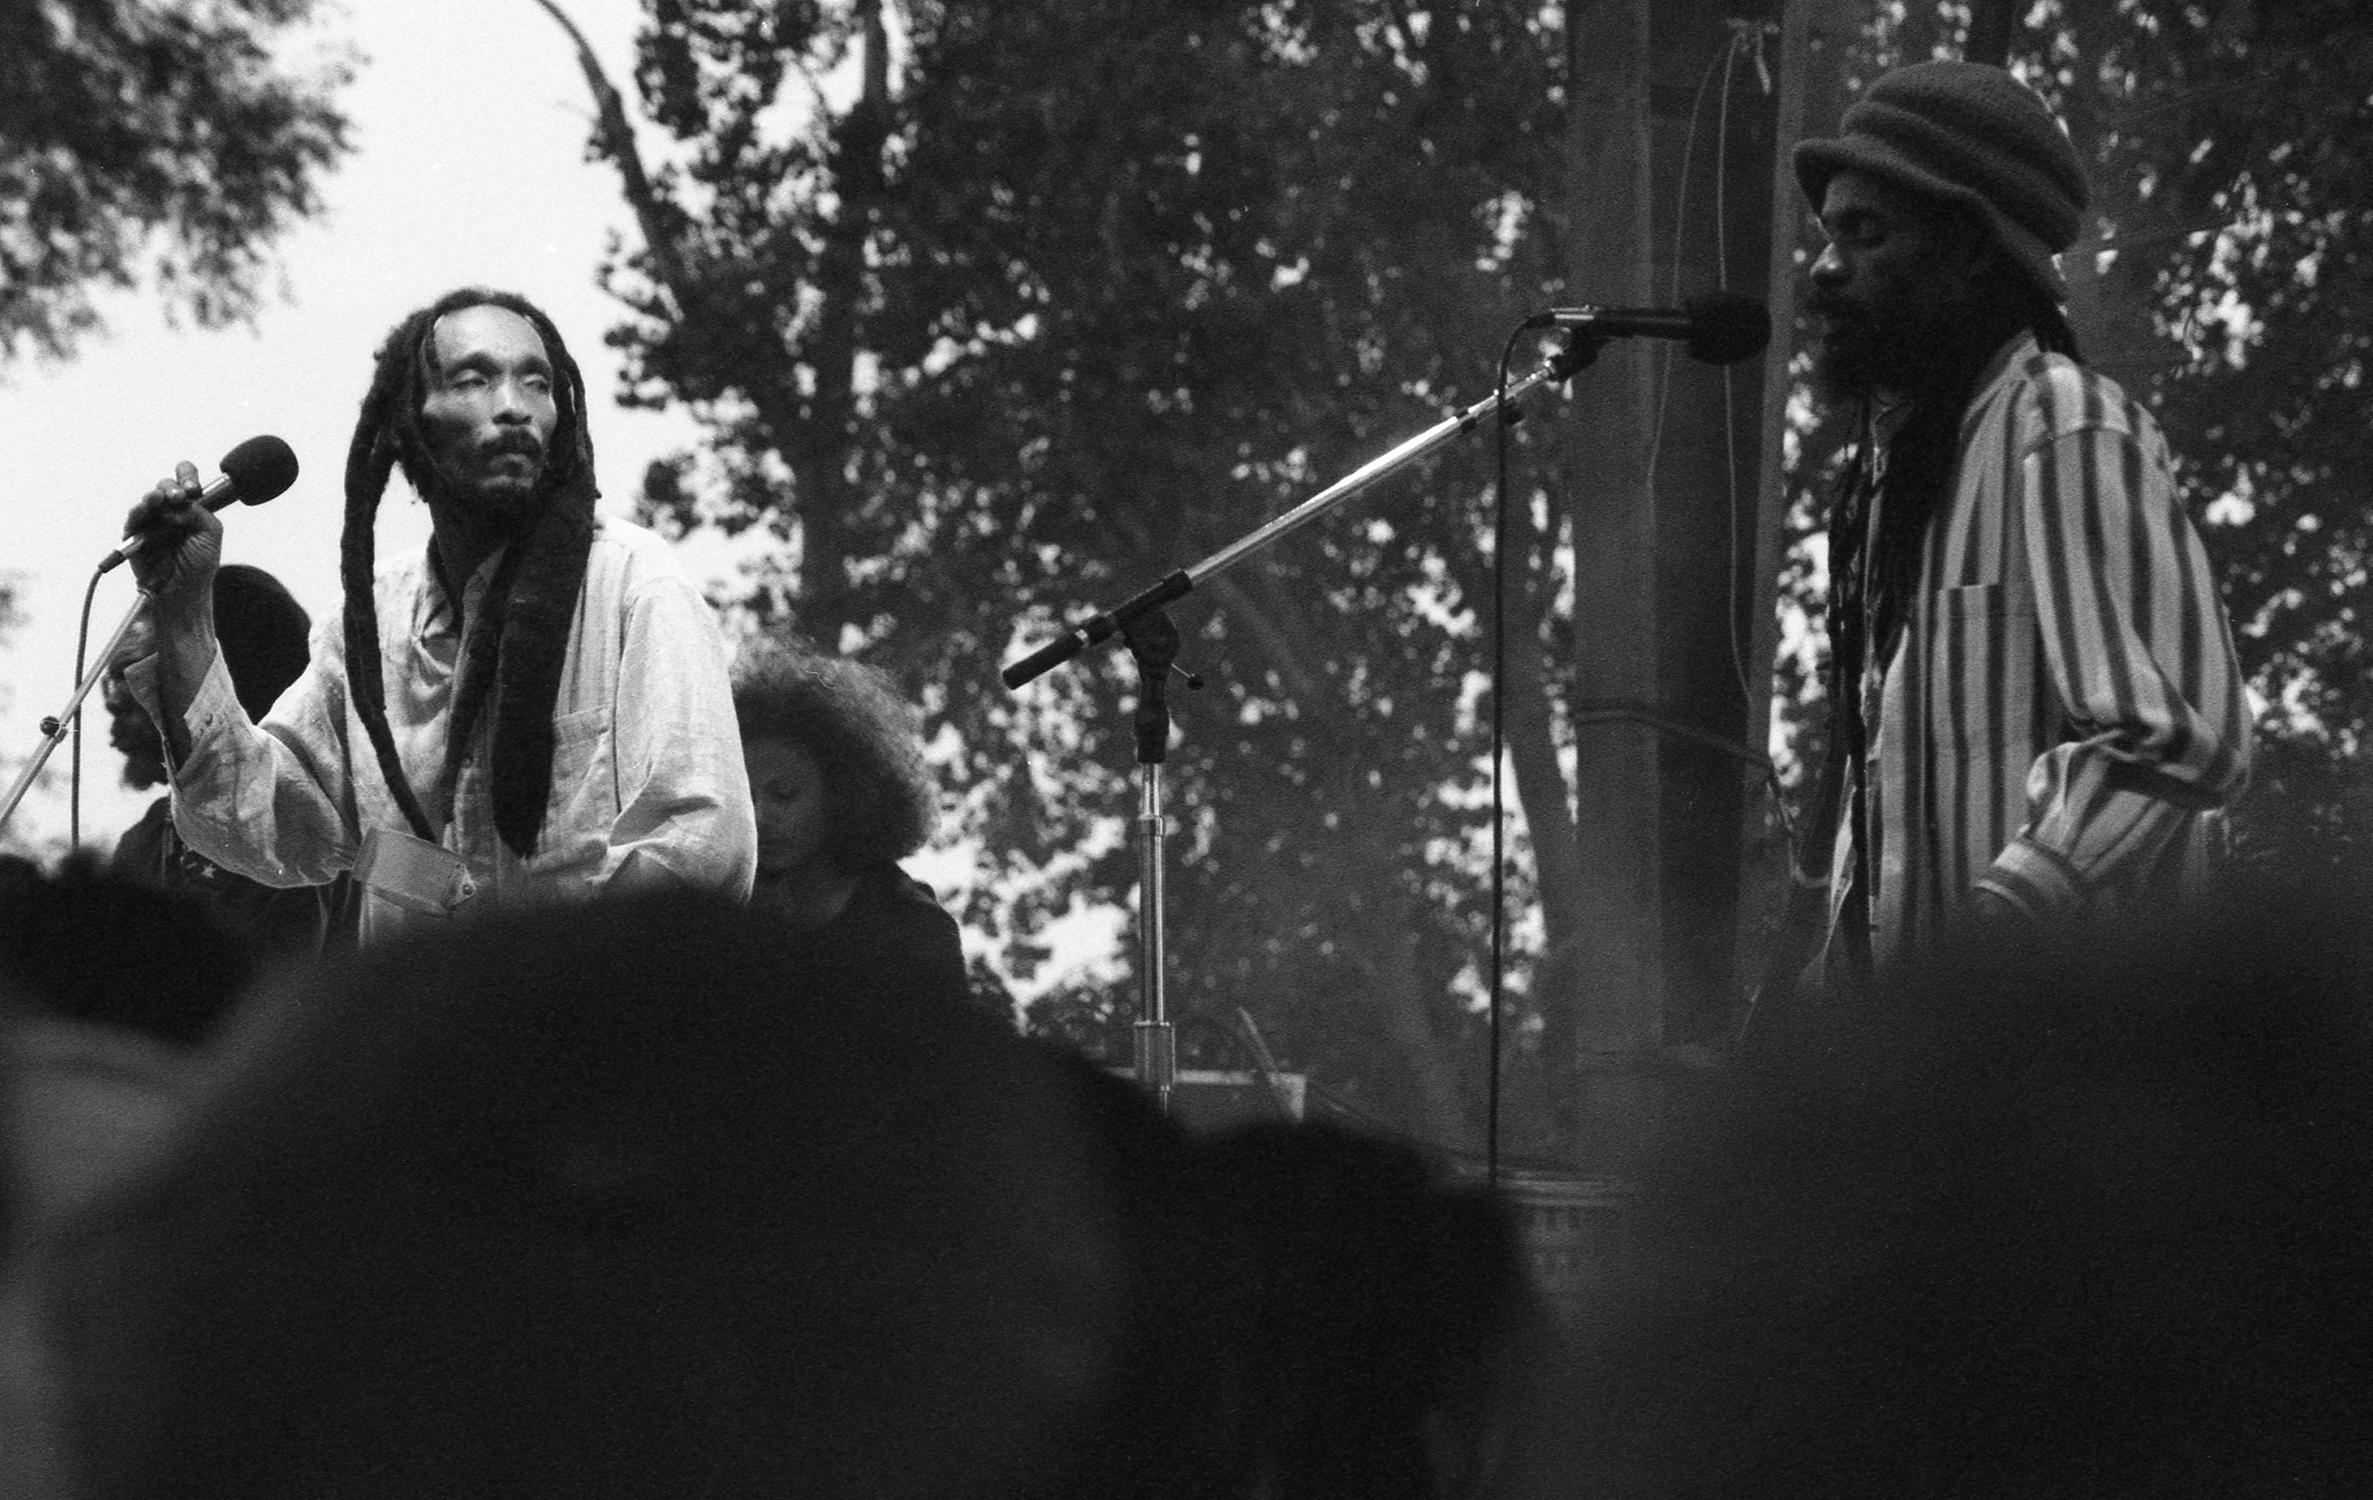 Israel Vibration, Sierra Nevada World Music Festival, Marysville, CA,6/21/97